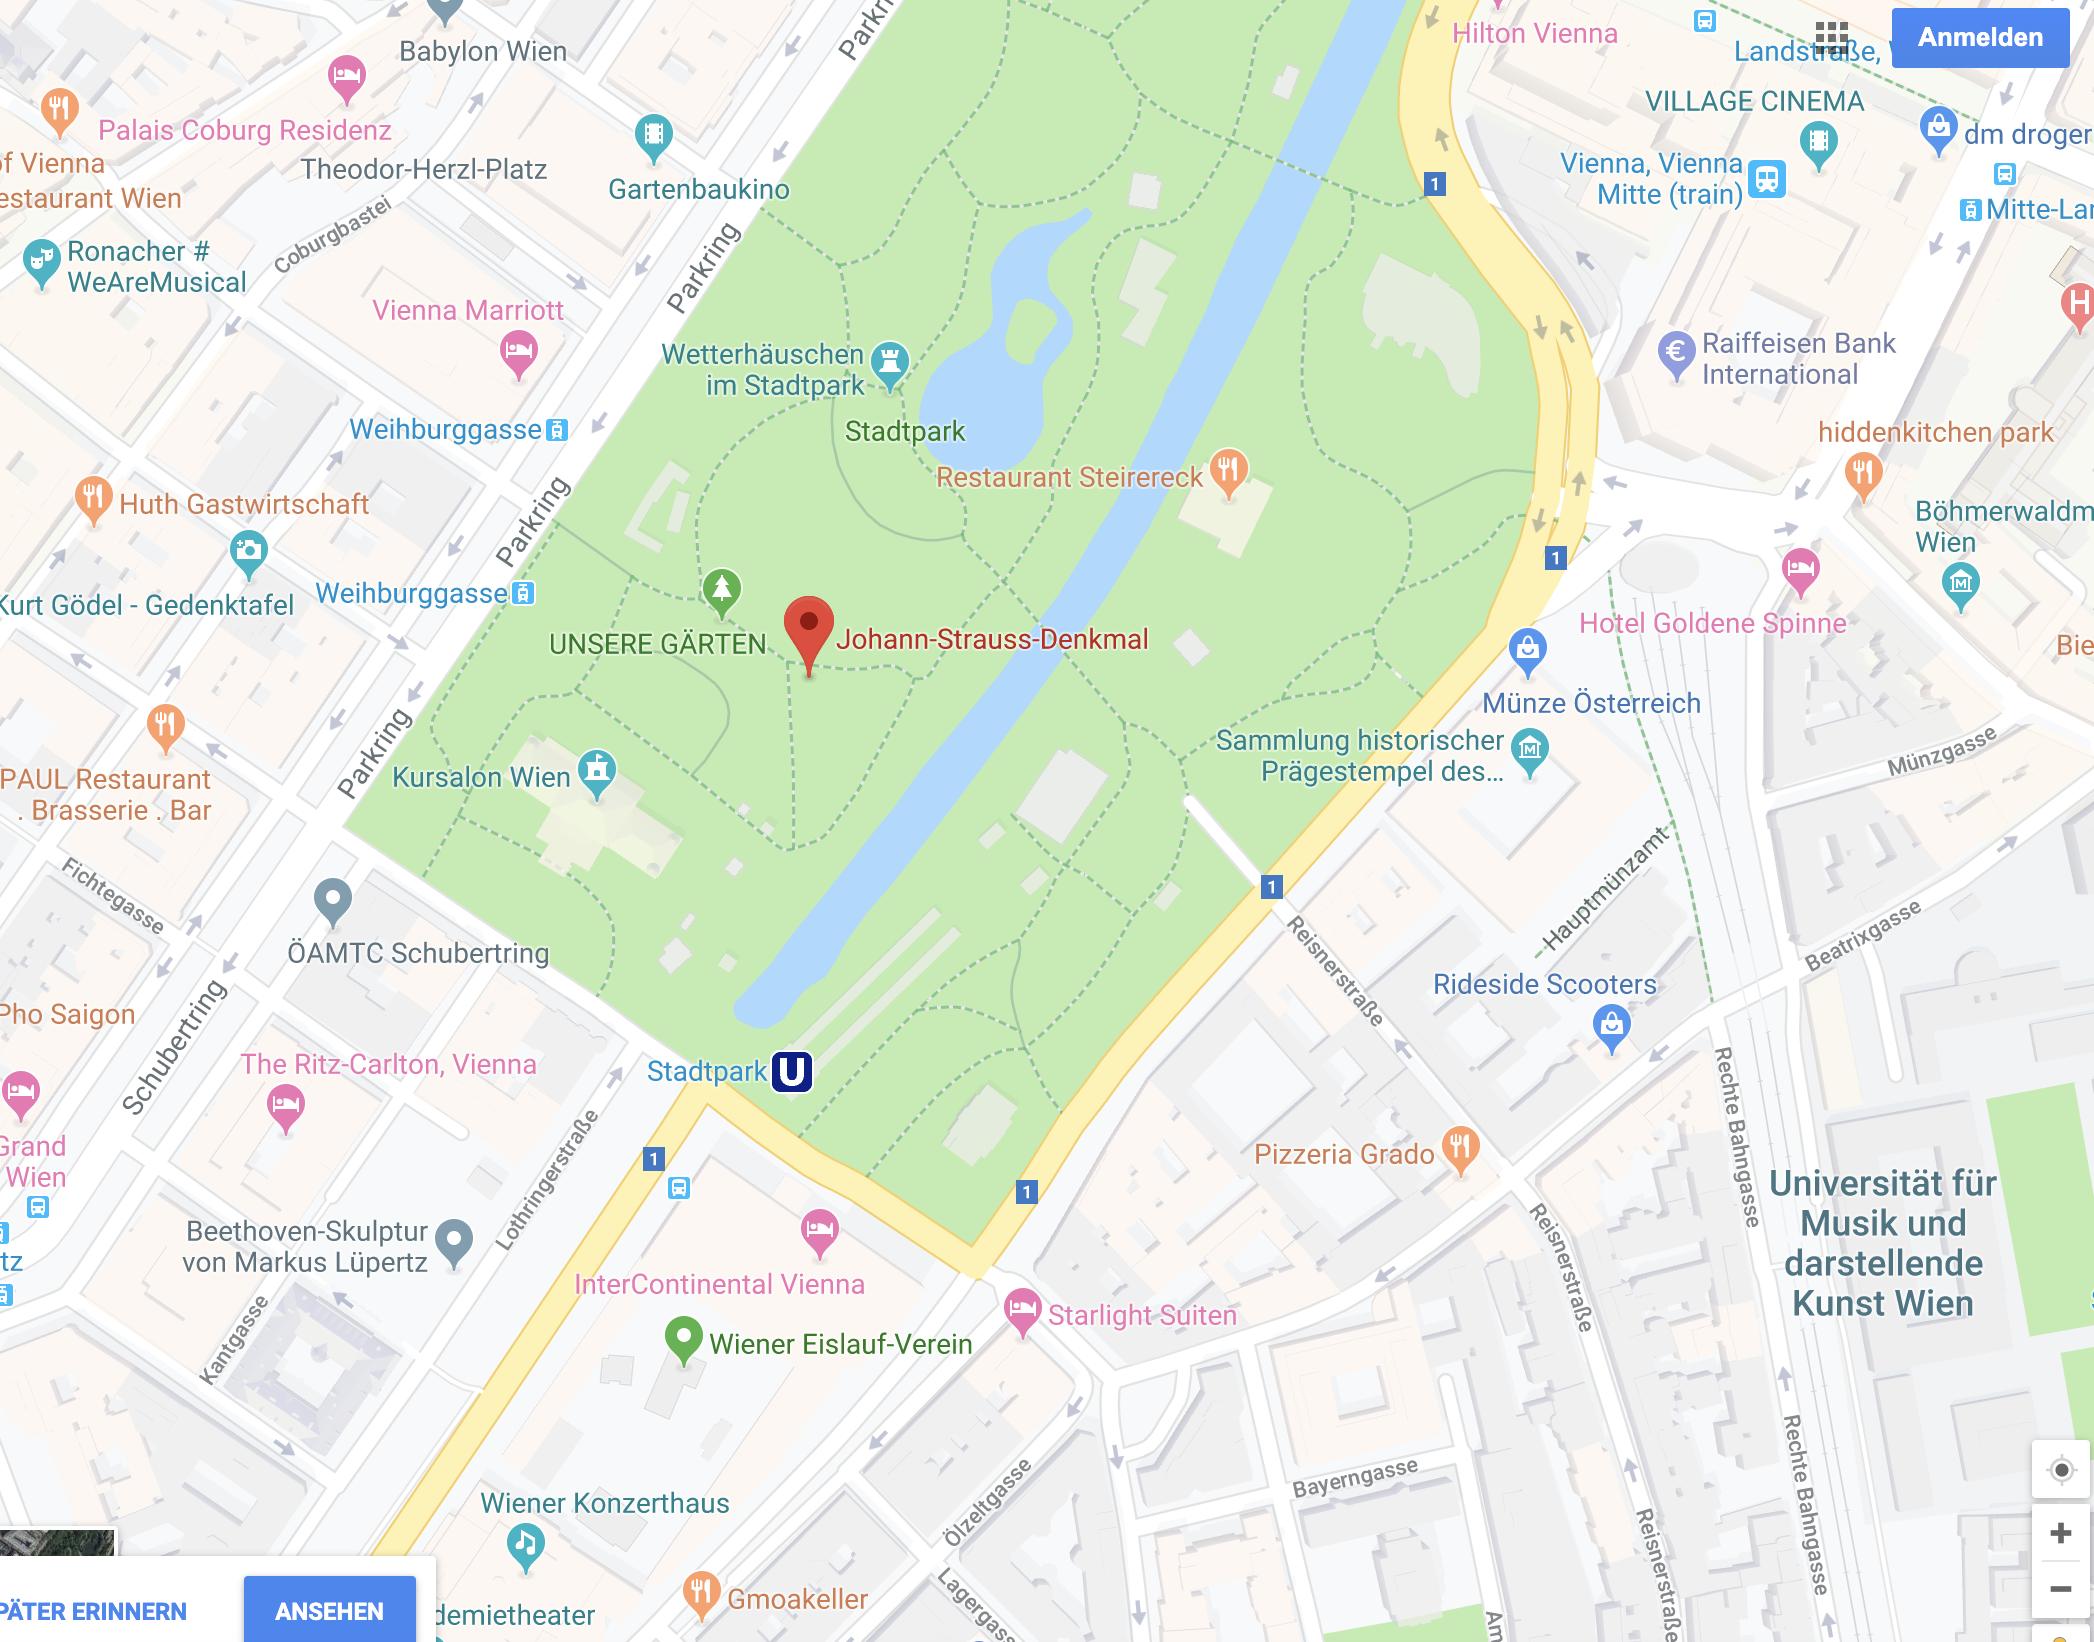 Google Maps - Johann-Strauß-Denkmal